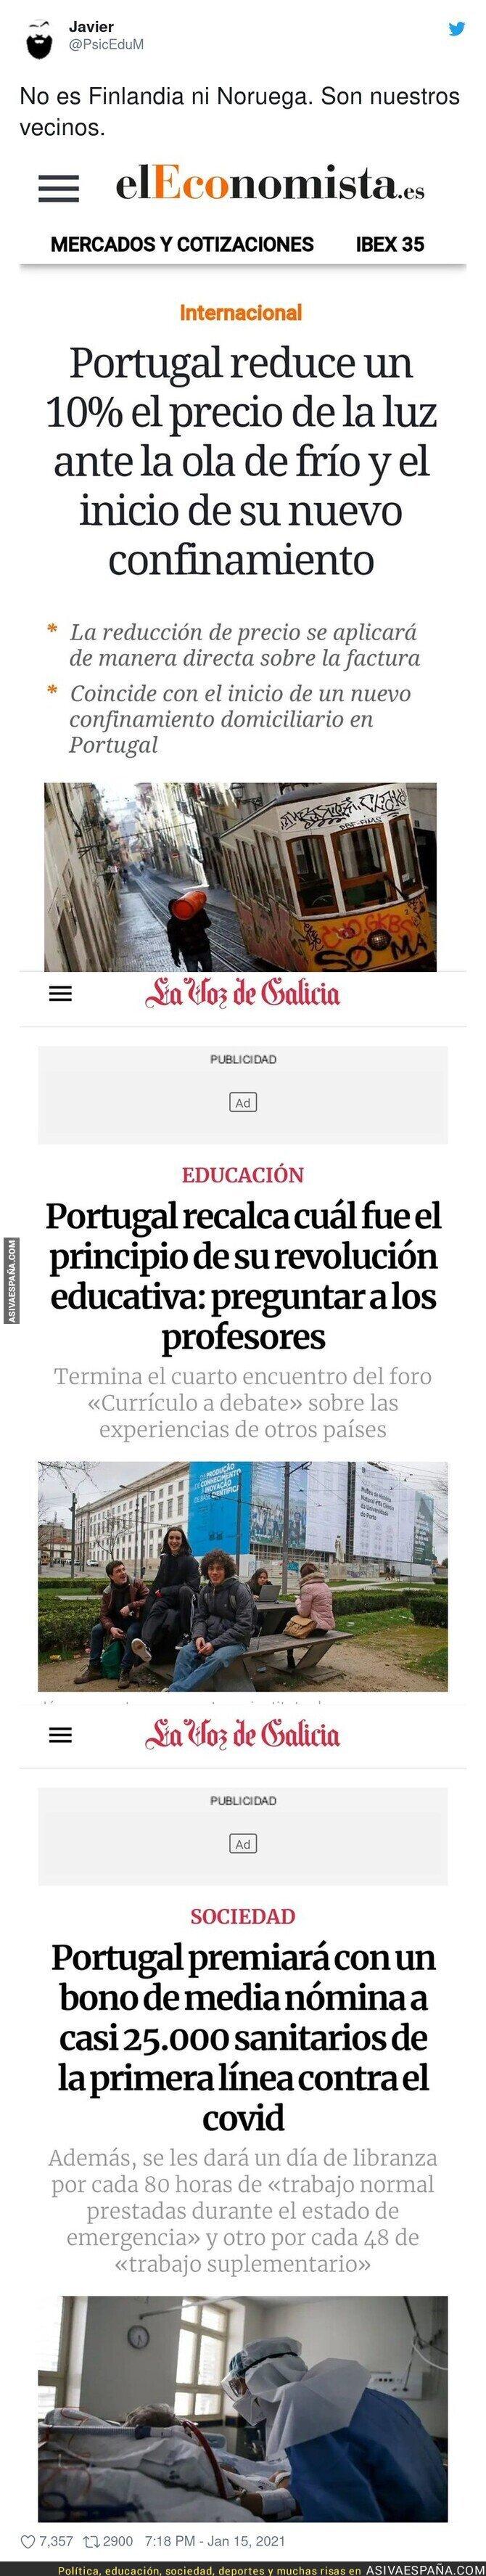 554201 - Portugal es un país ejemplar